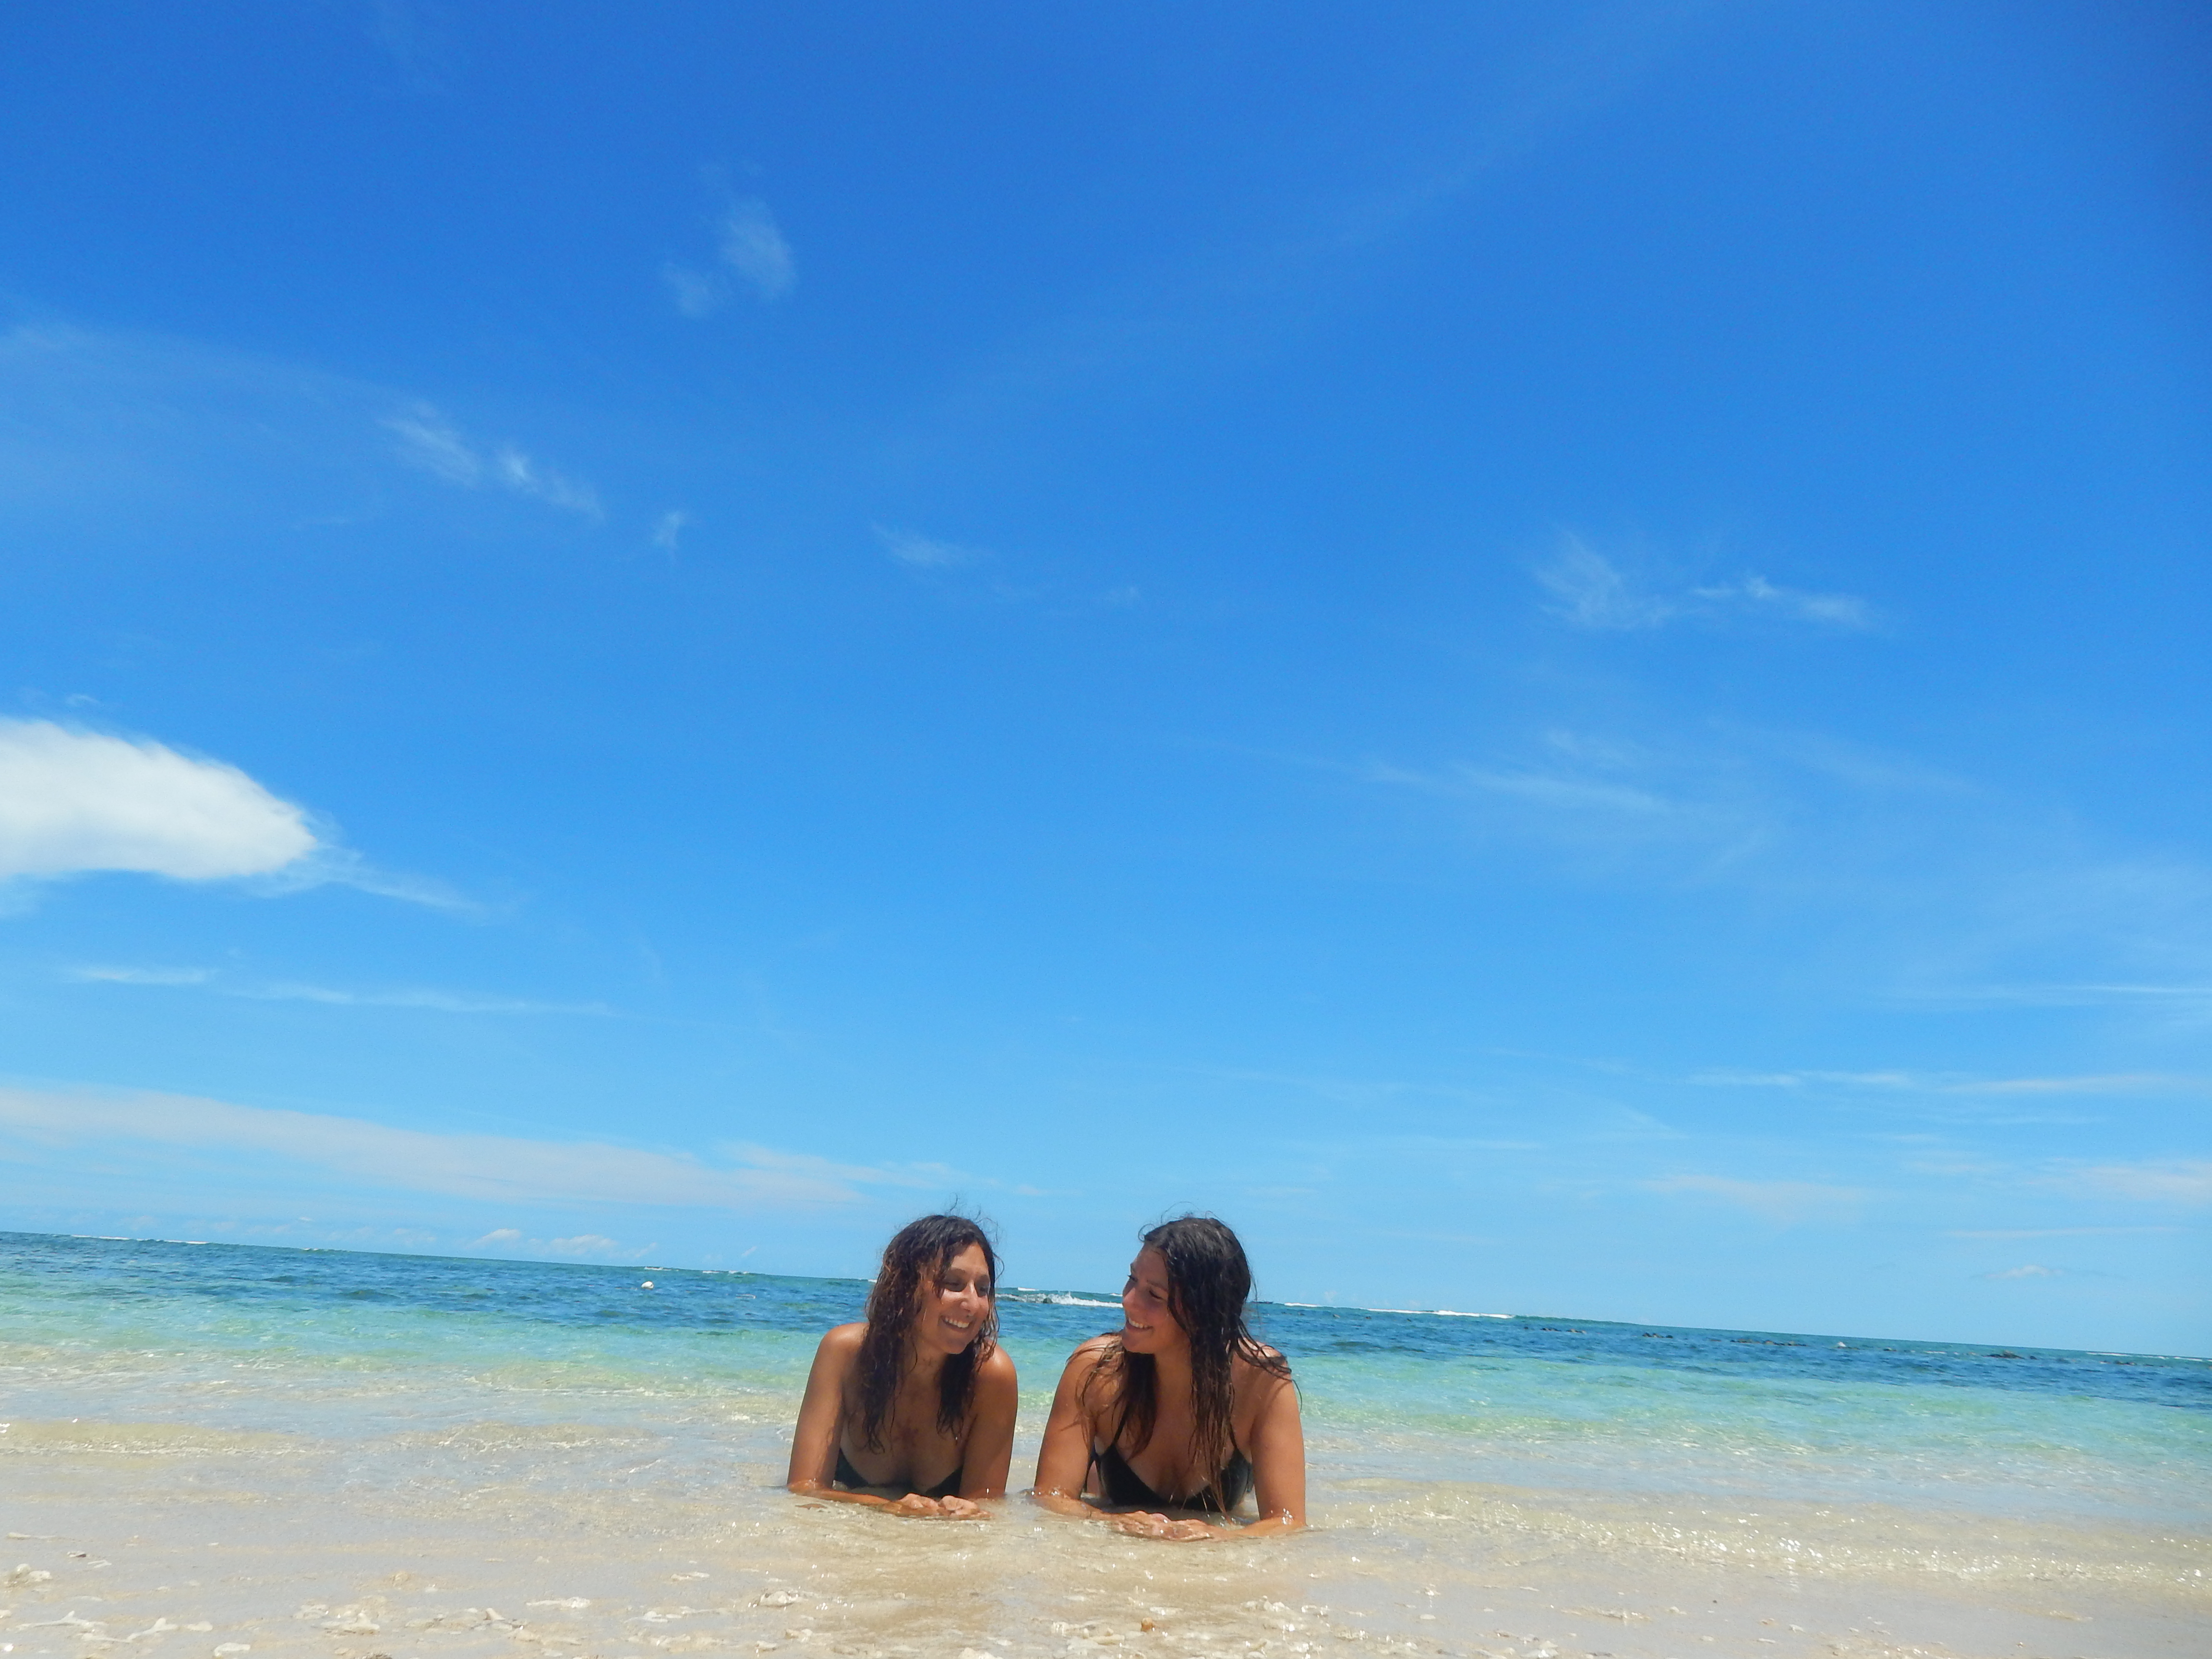 Plage de sable blanc Gili Air Indonésie